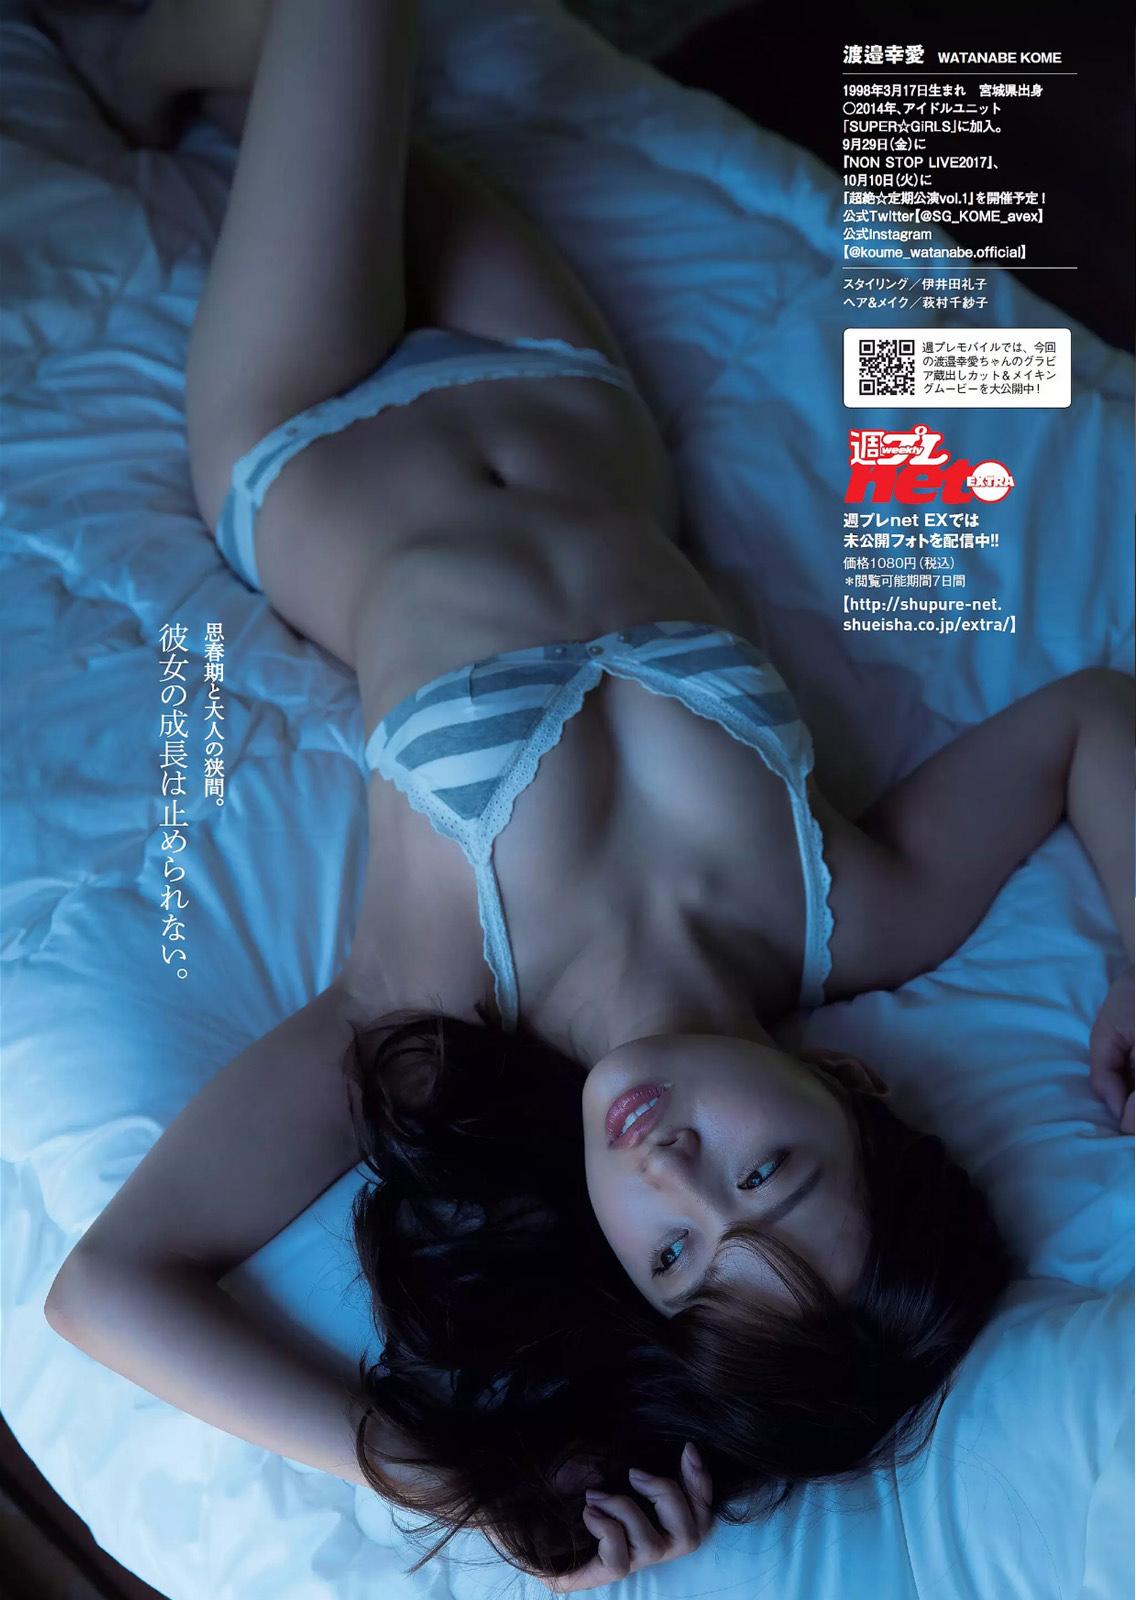 Watanabe Koume 渡邉幸愛, Weekly Playboy 2017 No.39-40 (週刊プレイボーイ 2017年39-40号)